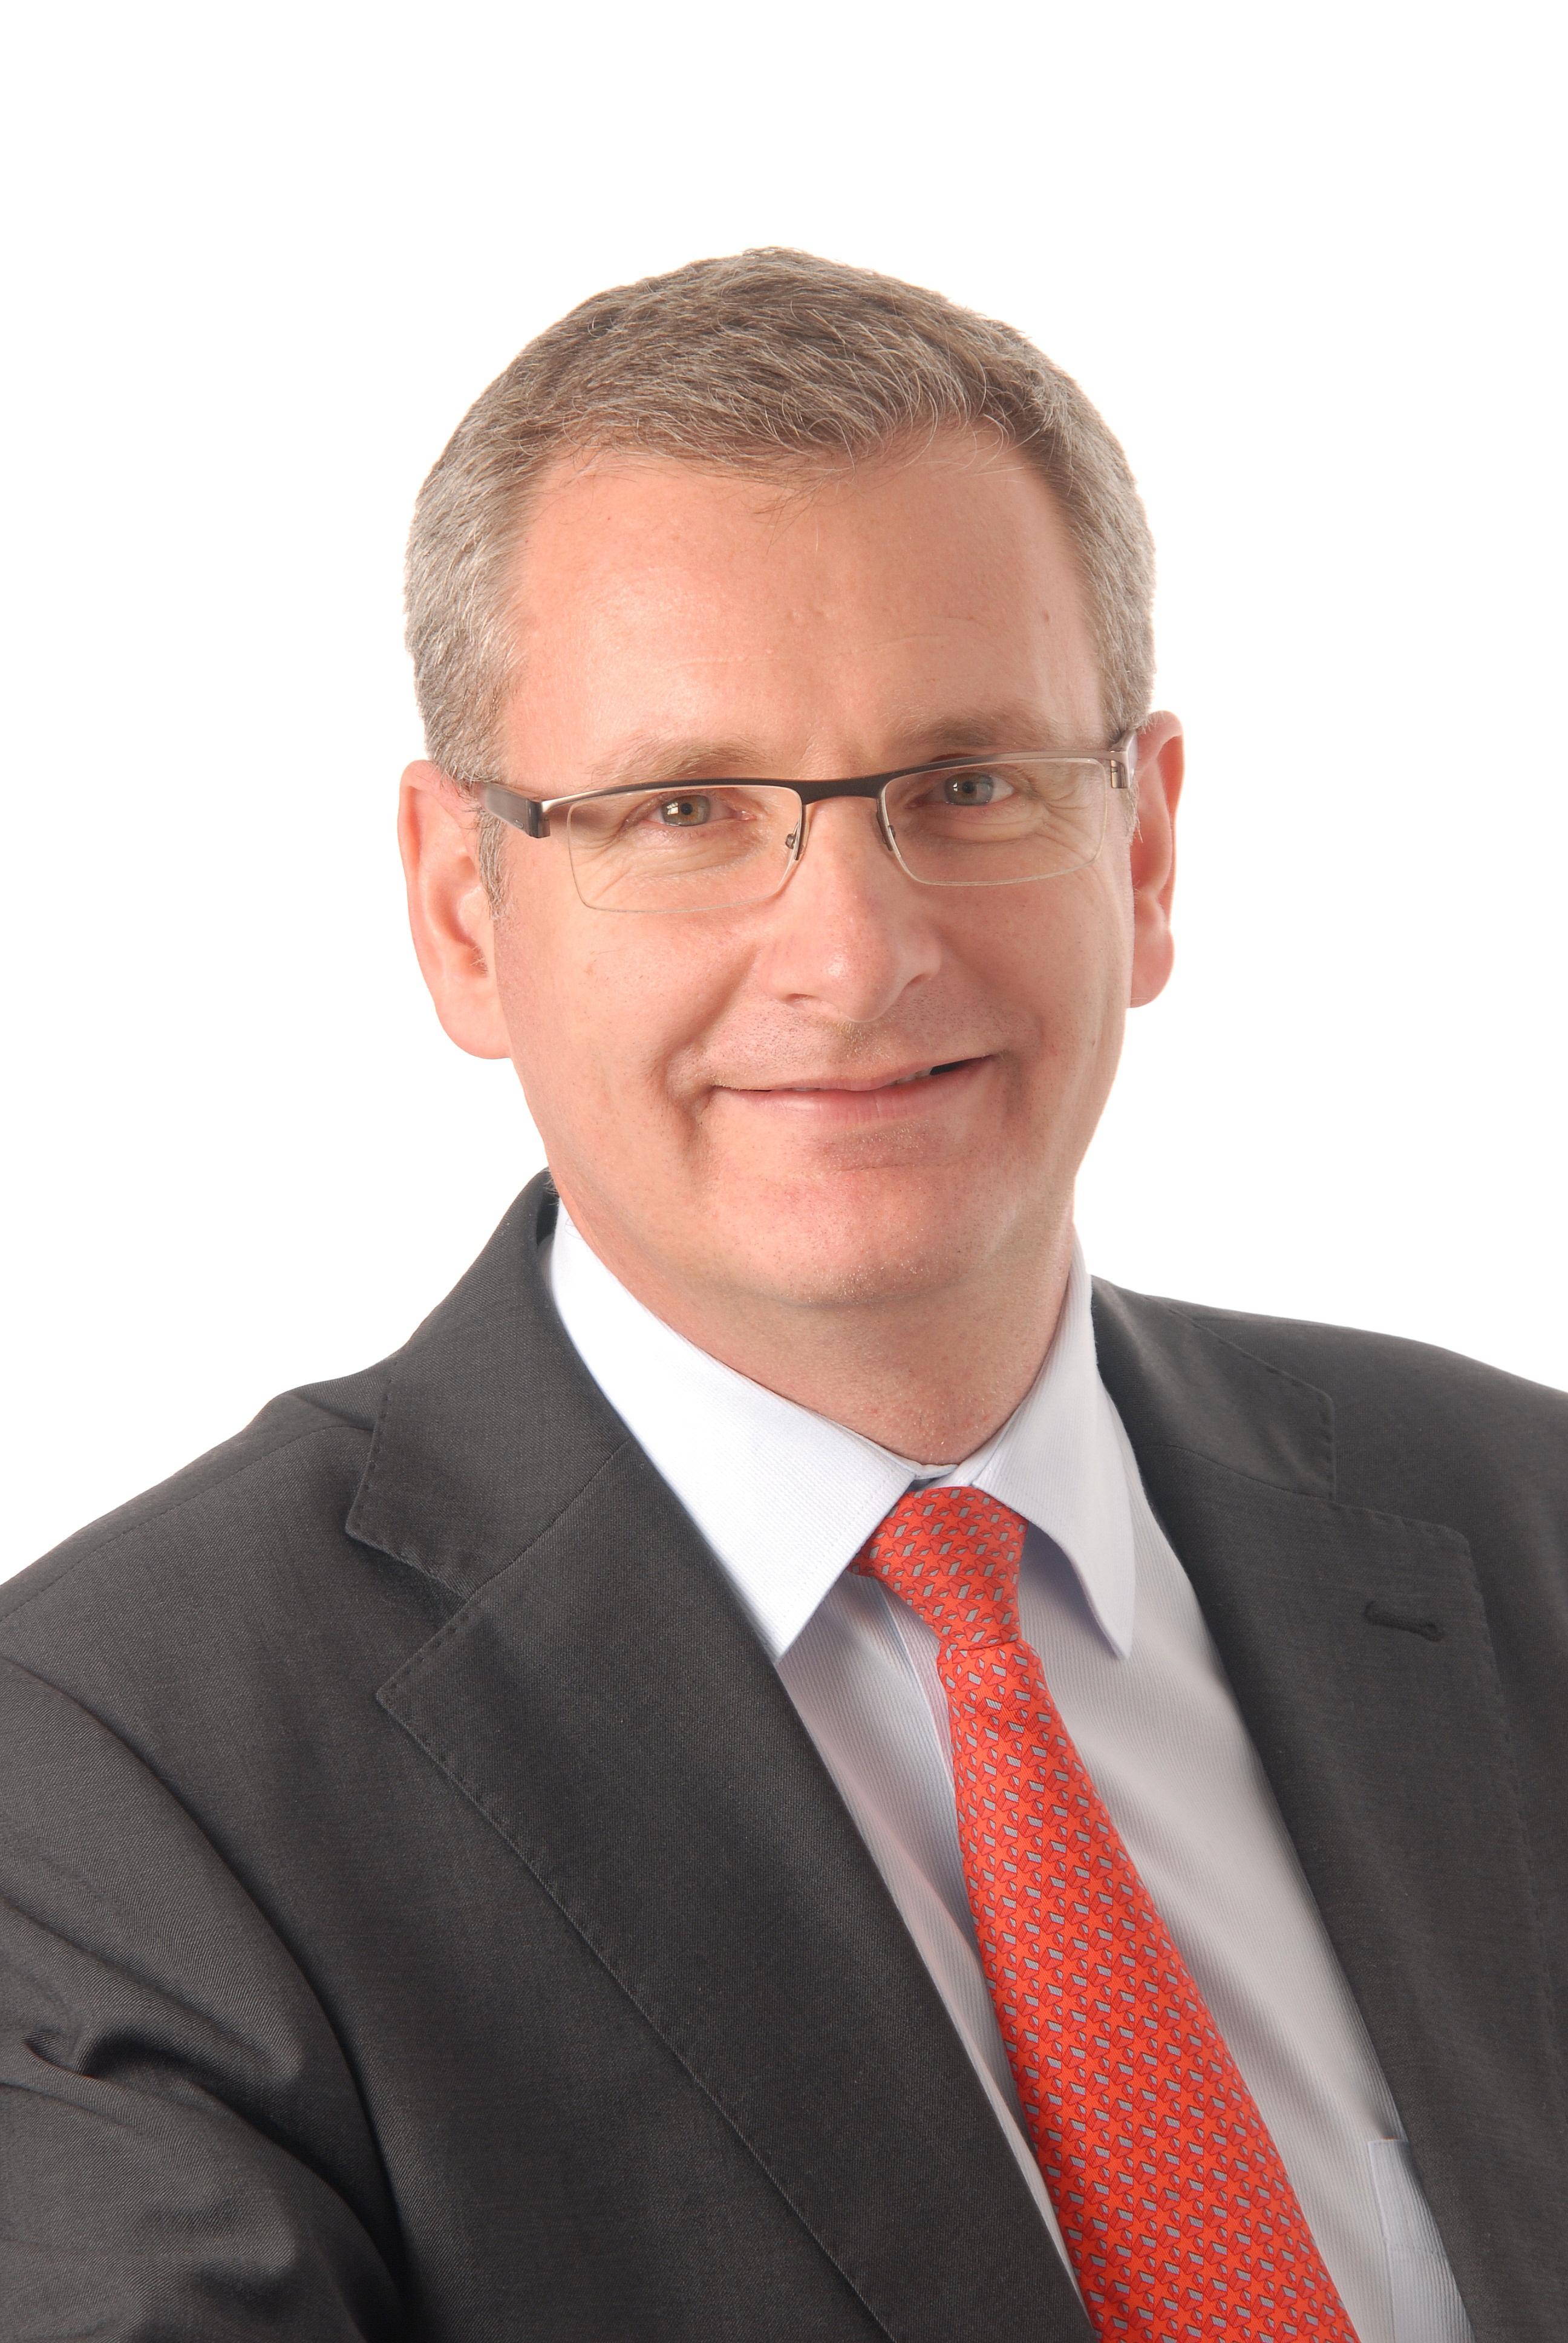 OHI appoints Ivan Coyard as Group CFO